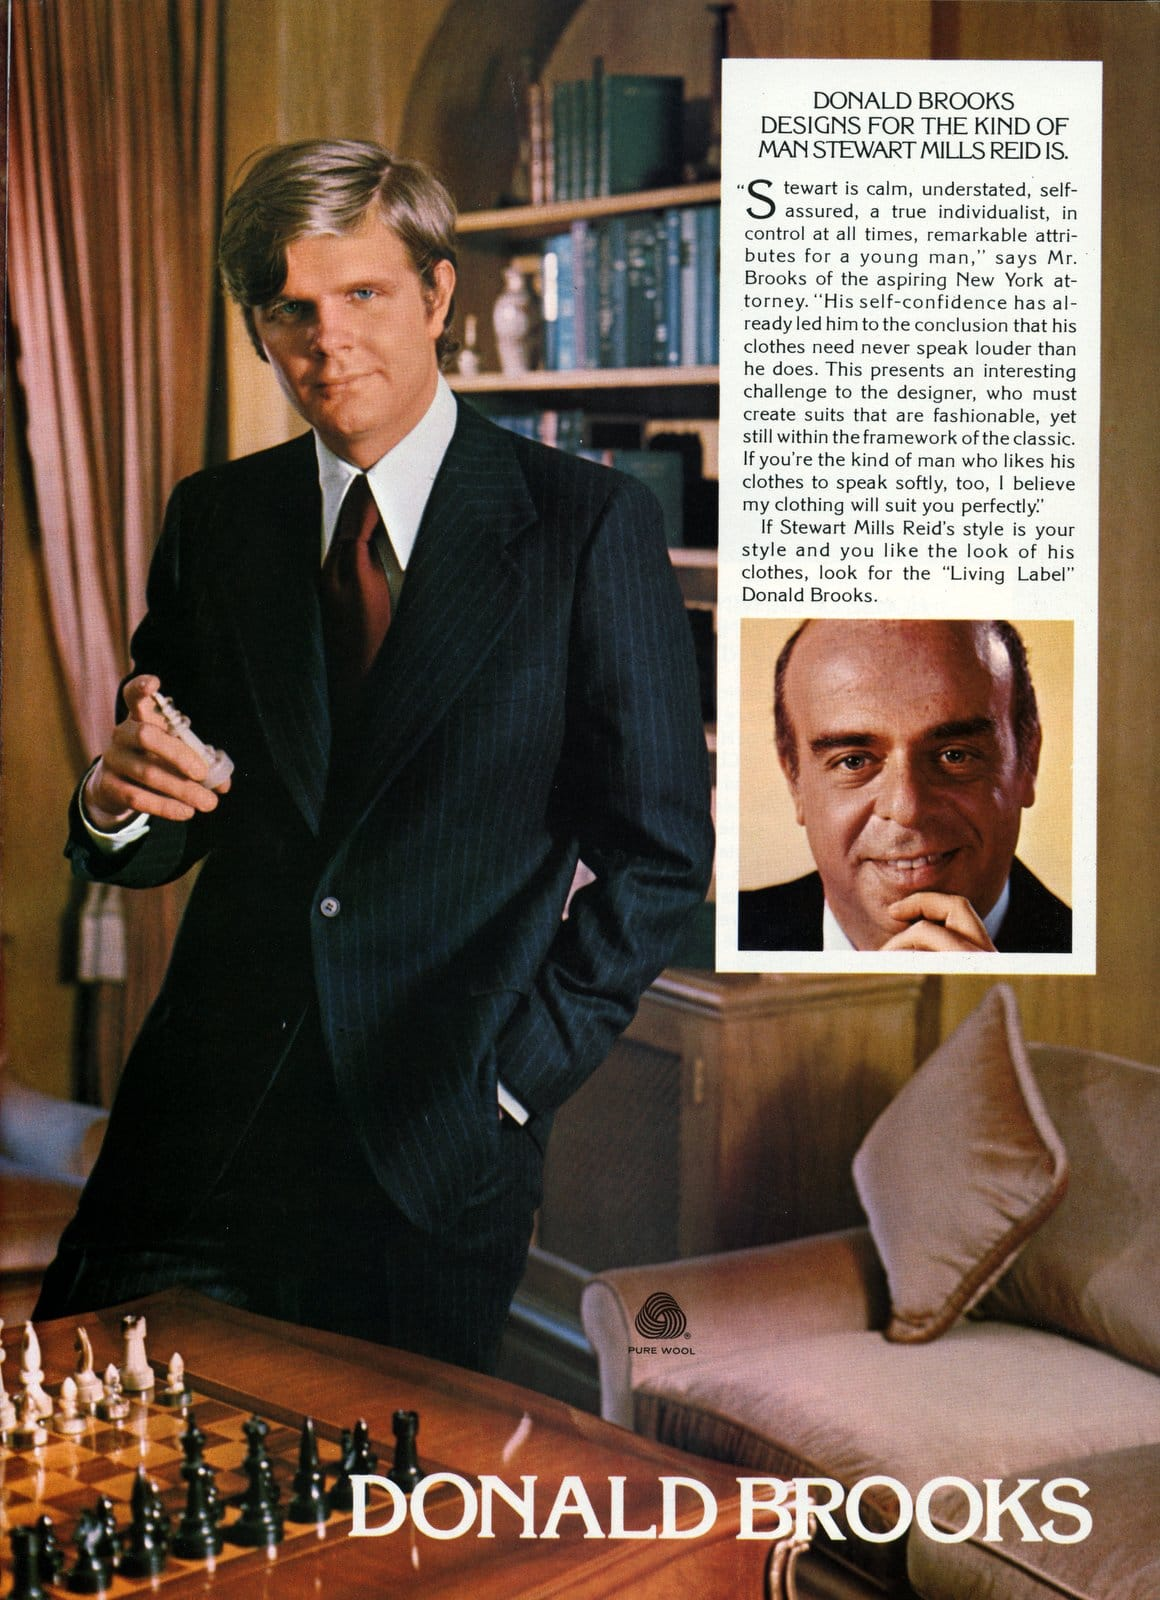 Designer suits for men from 1976 - Donald Brooks - Stewart Mills Reid